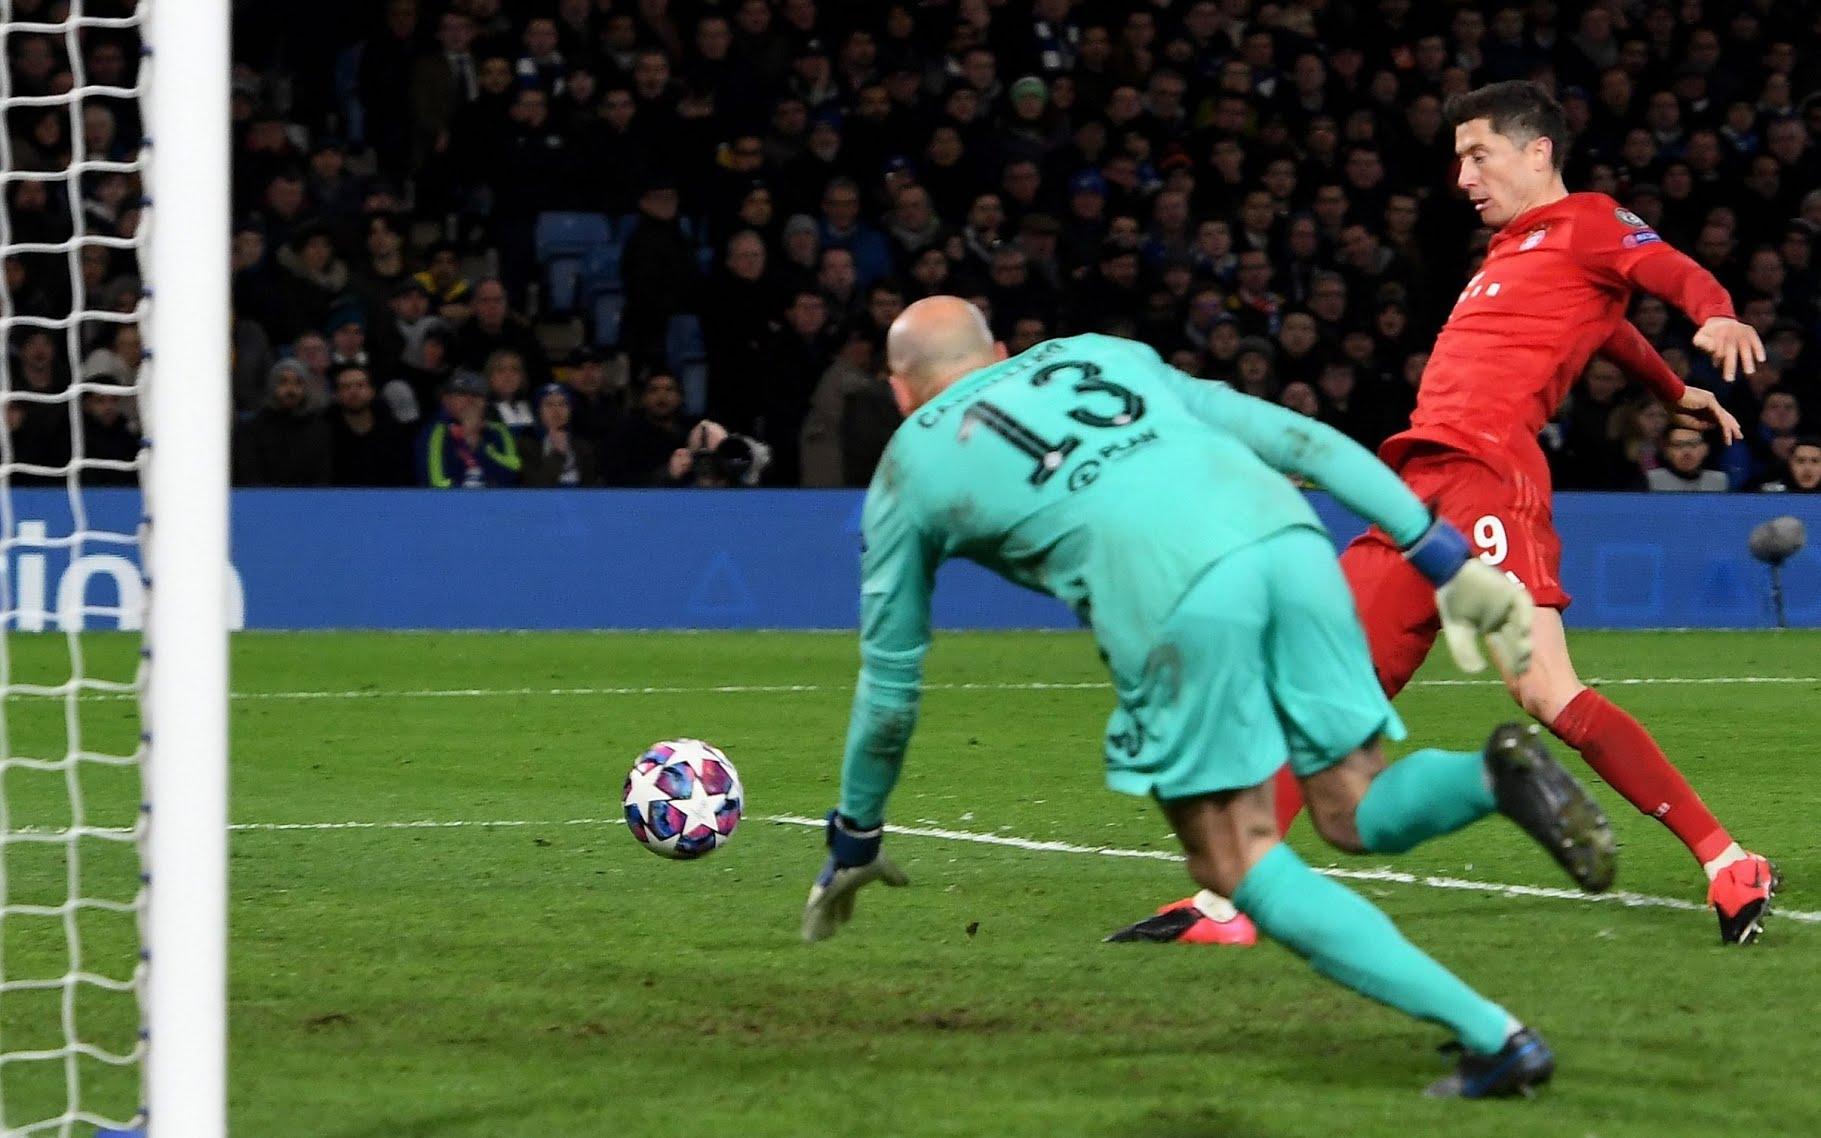 Lewandowski gives Bayern an unassailable lead with their third